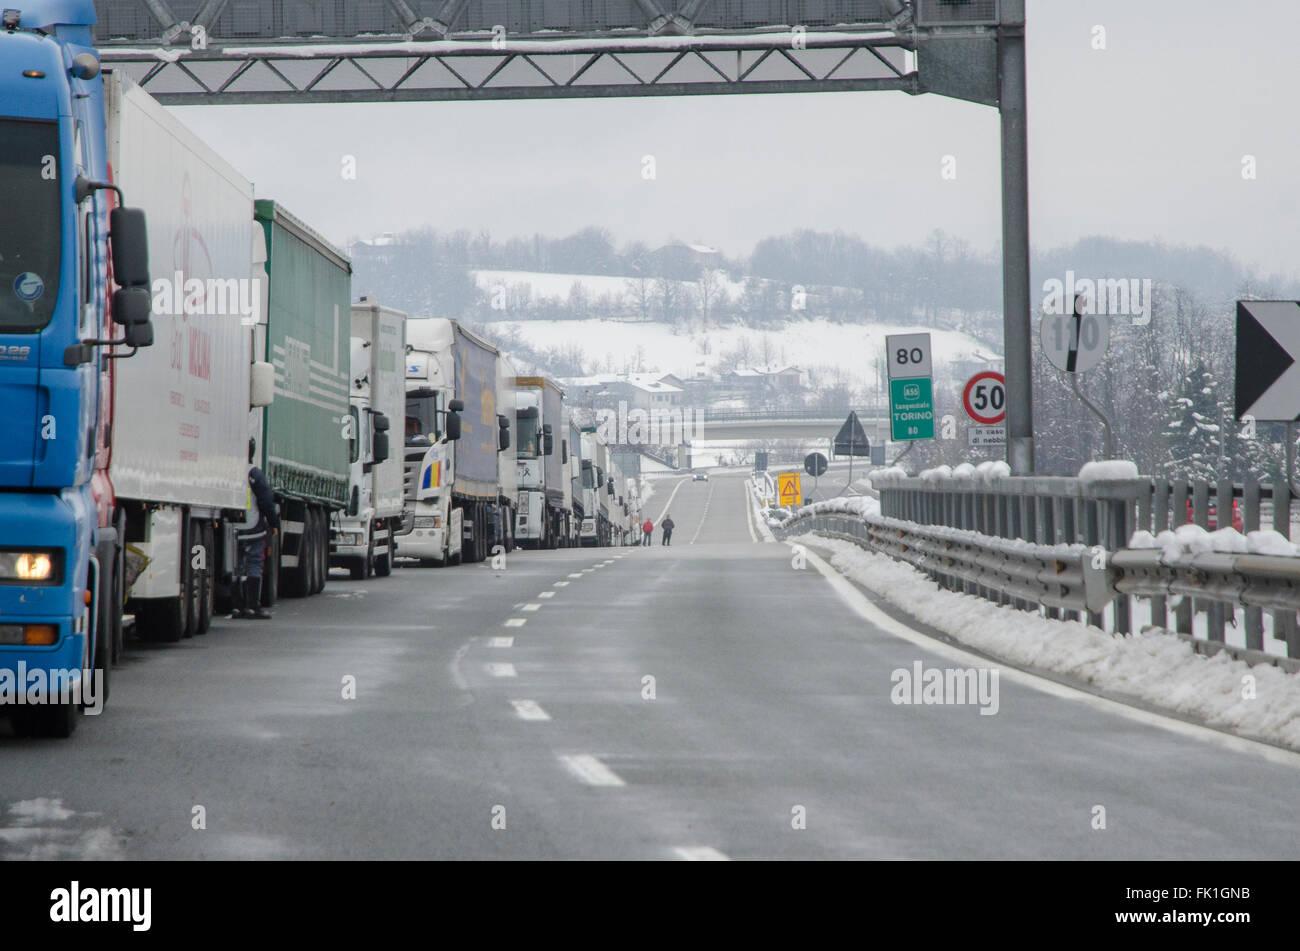 A6 Torino-Savona, Italy. 5th March, 2016. Italy-Roadblock for snow on highway A6 Torino-Savona Credit:  Stefano Stock Photo